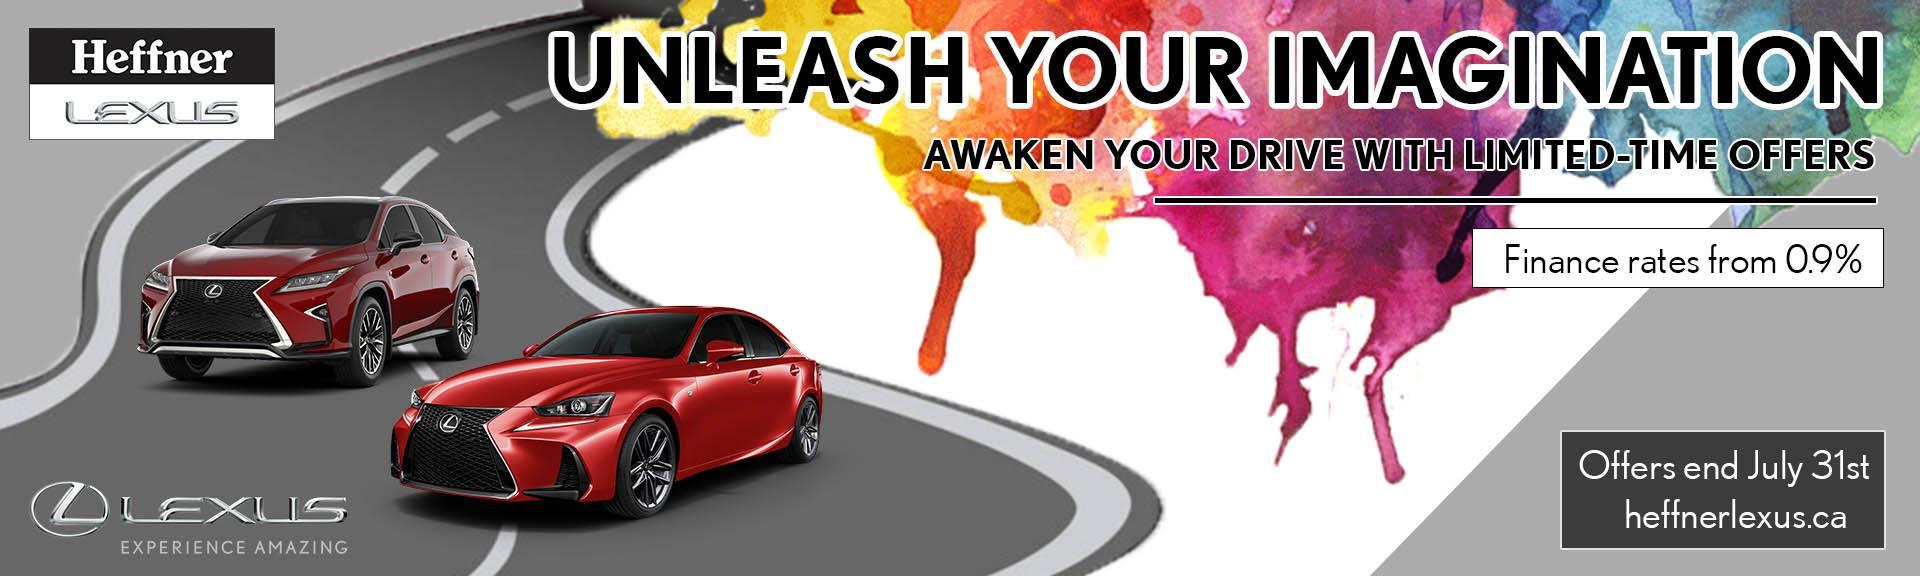 Unleash Your Imagination_July